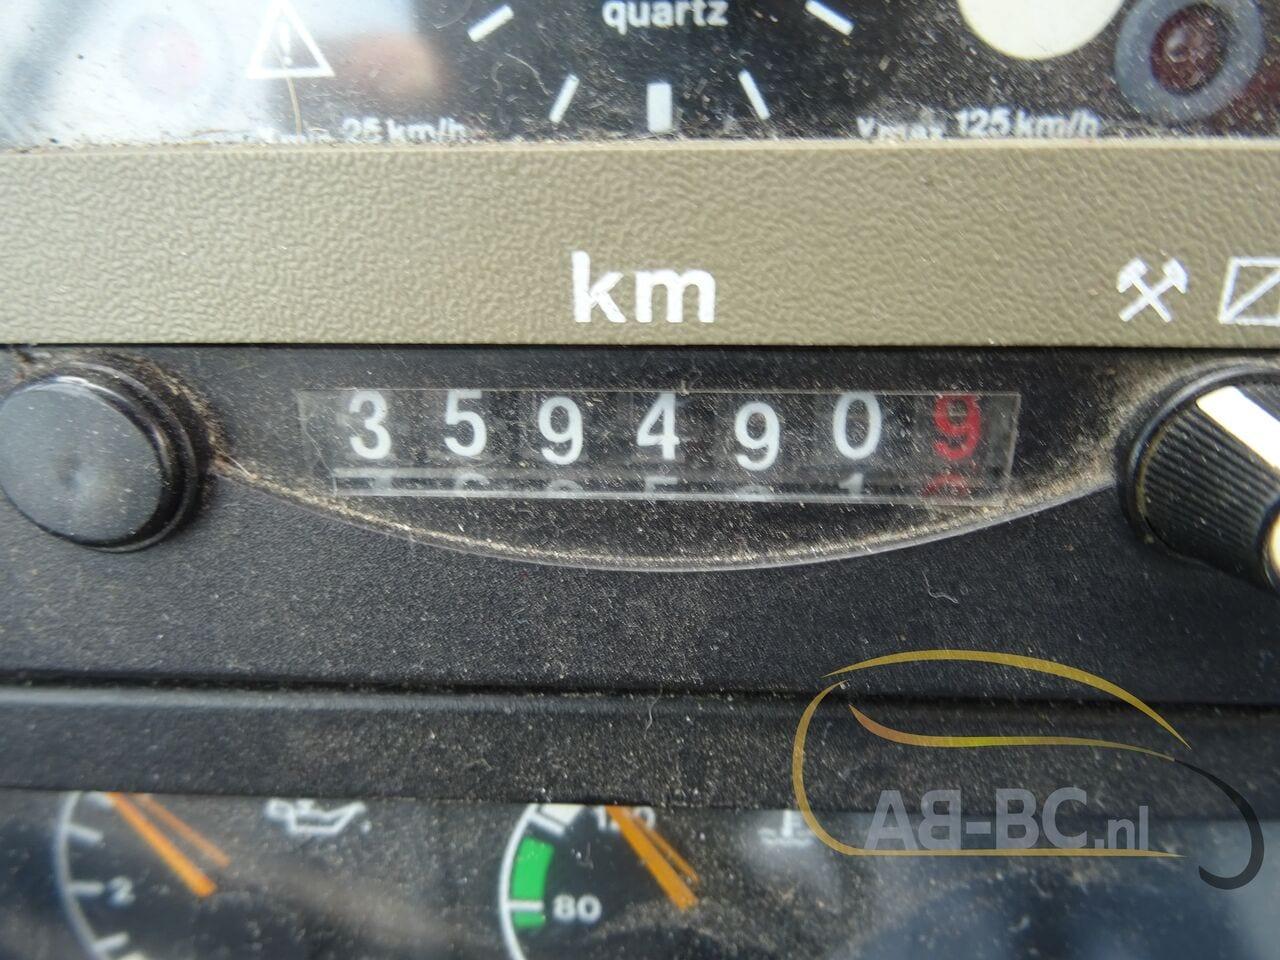 interurban-busMAN-Fast-64-seats---1619619895091992307_big_9878bfcccbc985c2419bd628817e2a7c--21042817163019598600